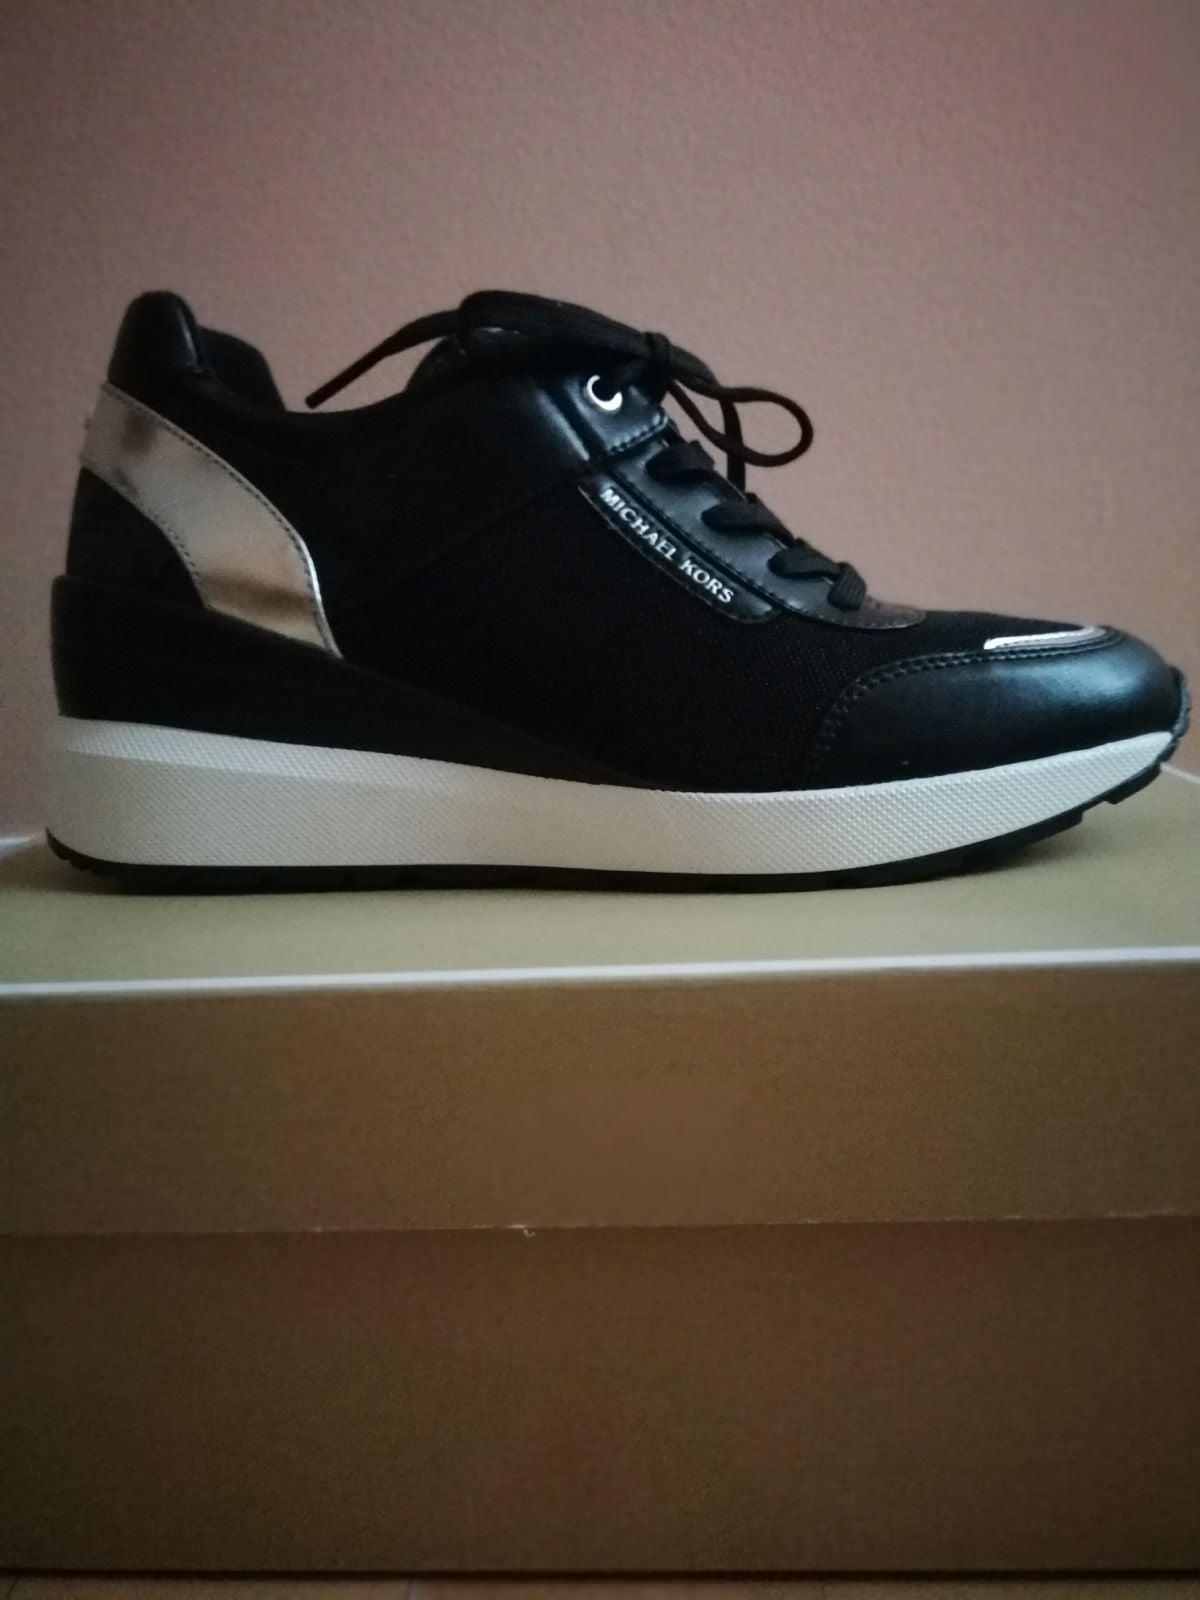 Michael Kors shoes wedge sneakers 7.5 bl